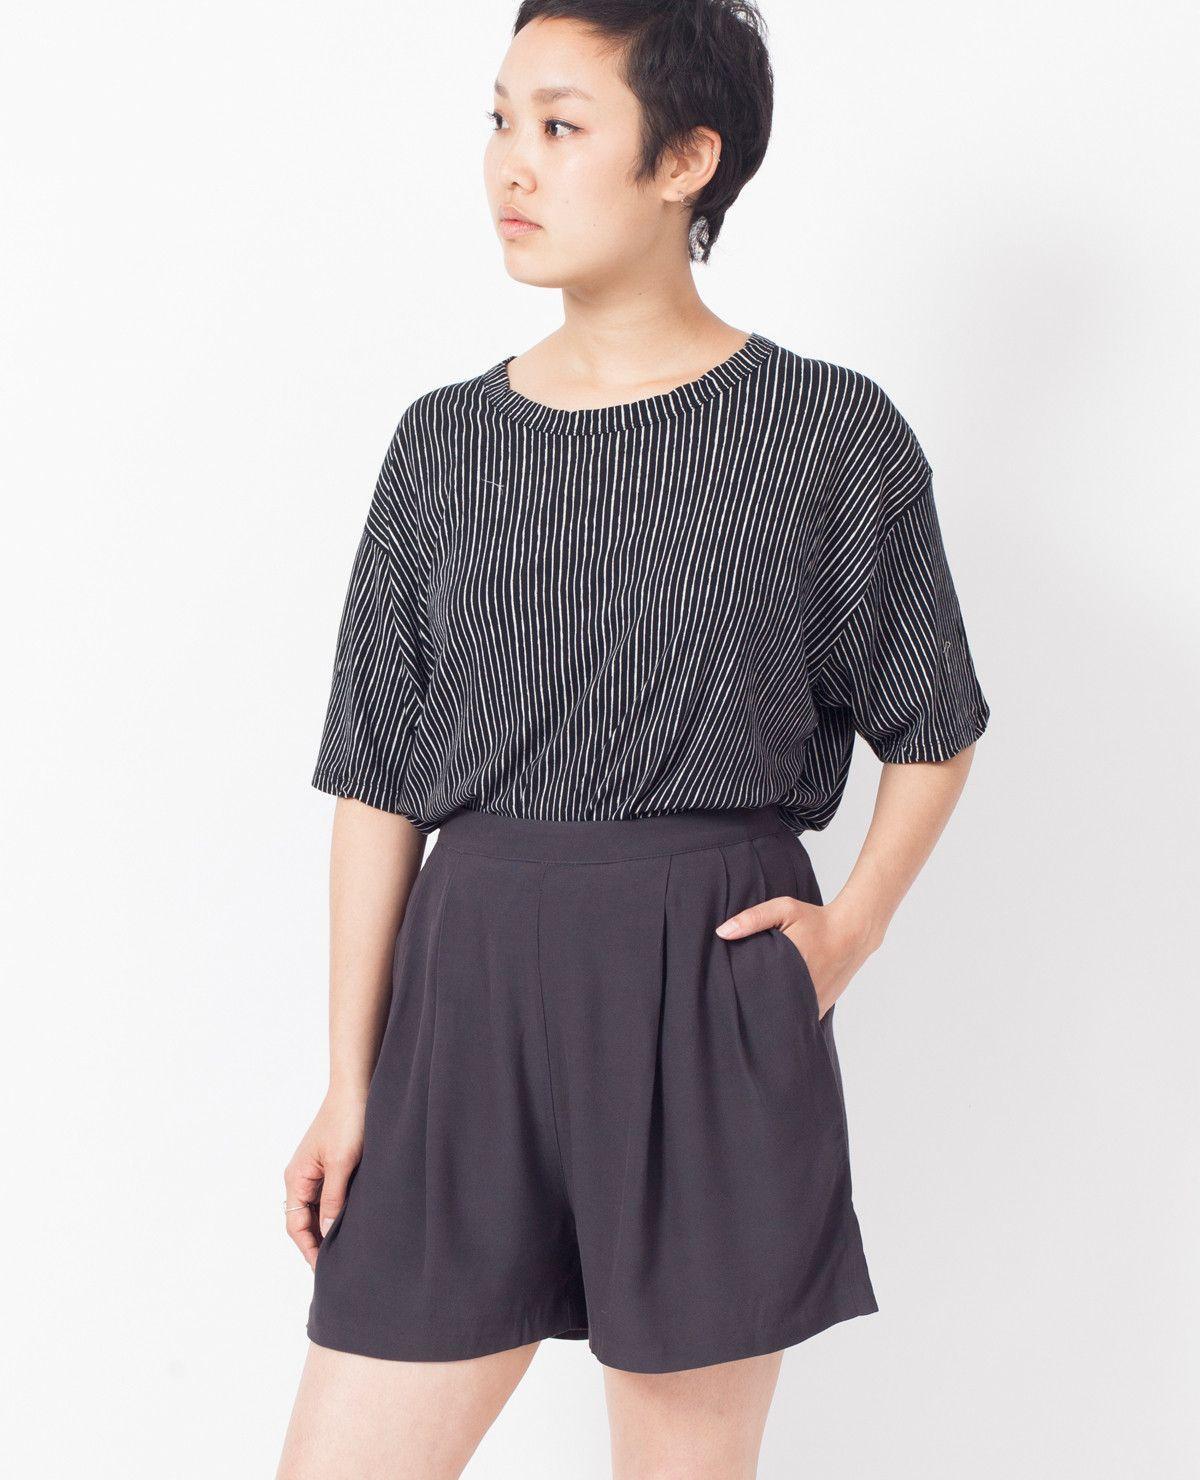 AMERICAN VINTAGE Celi Shorts / Carbon